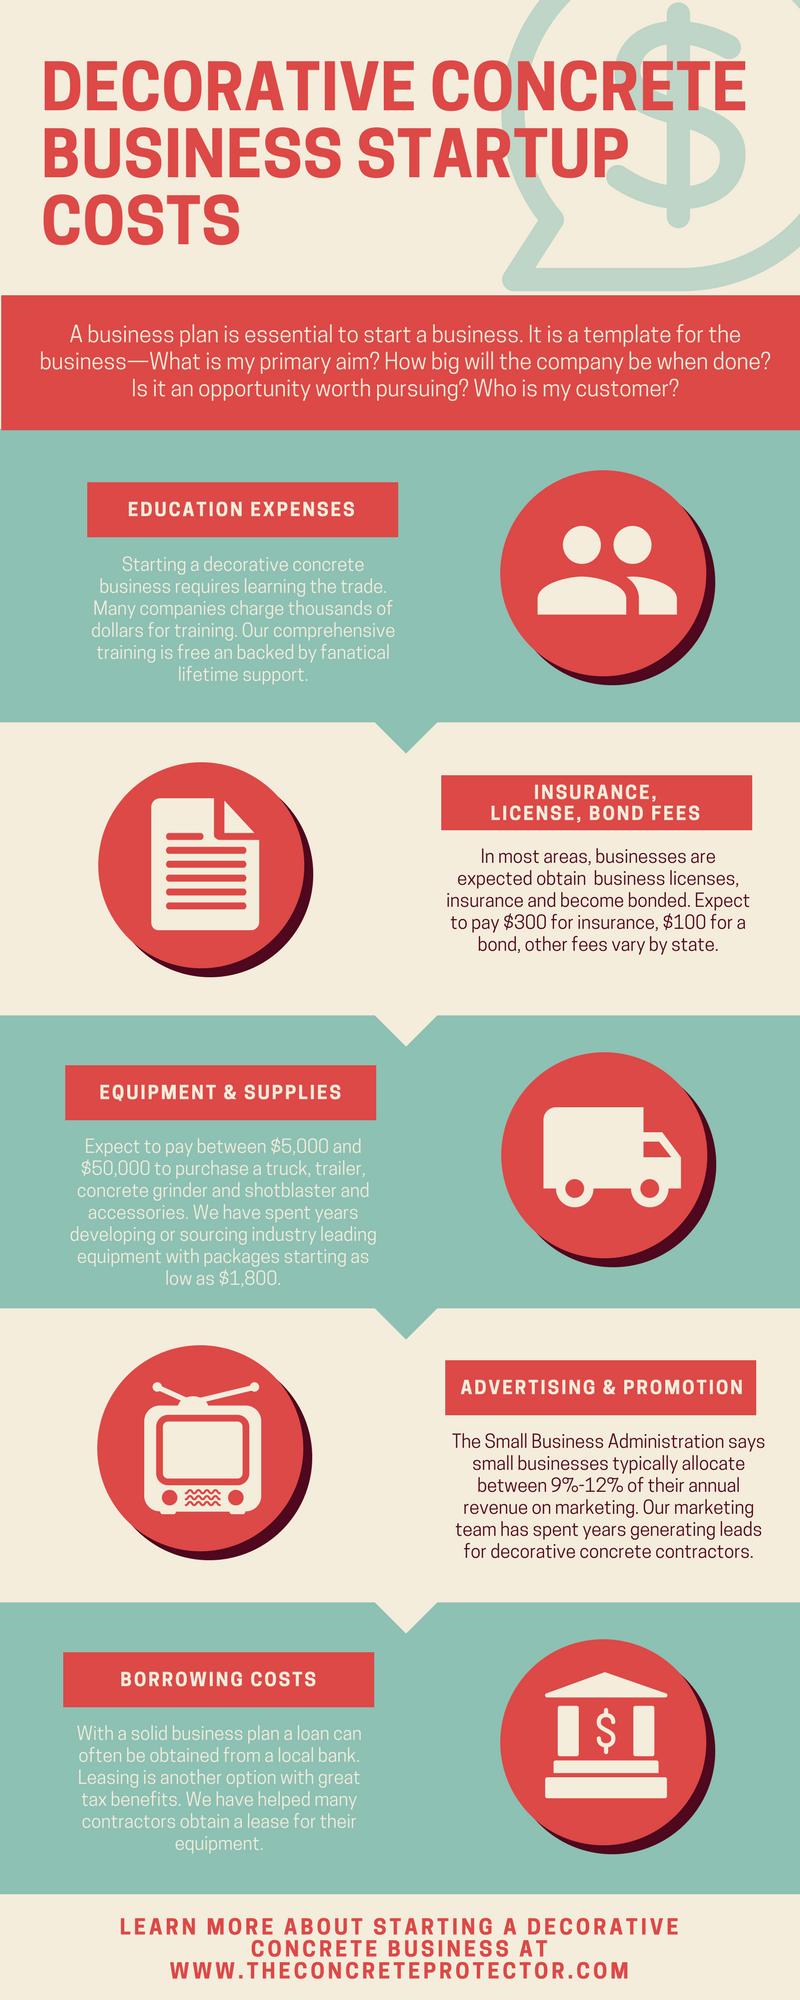 A Decorative Concrete Business Infographic